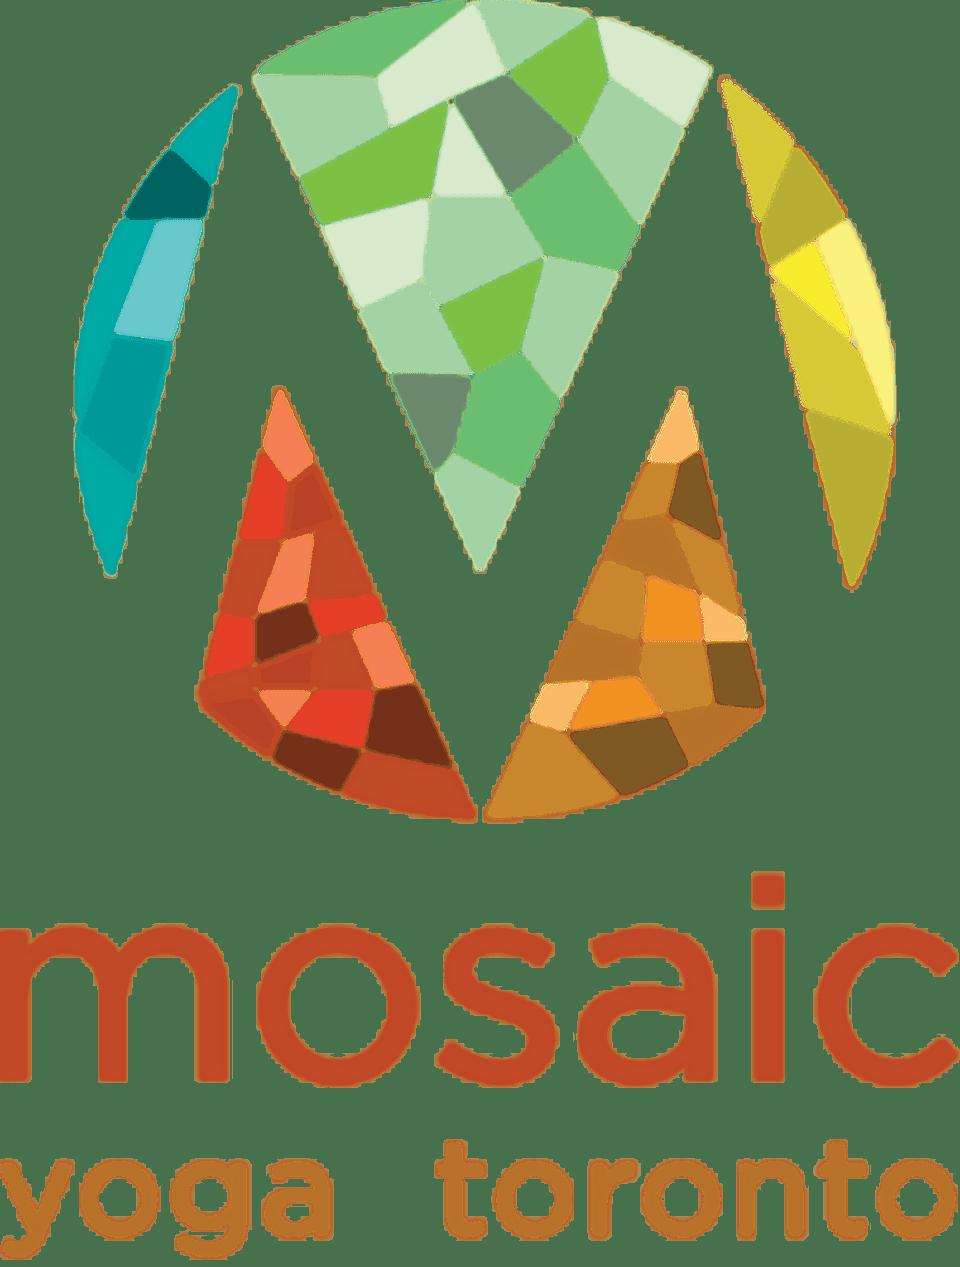 Mosaic Yoga Toronto logo